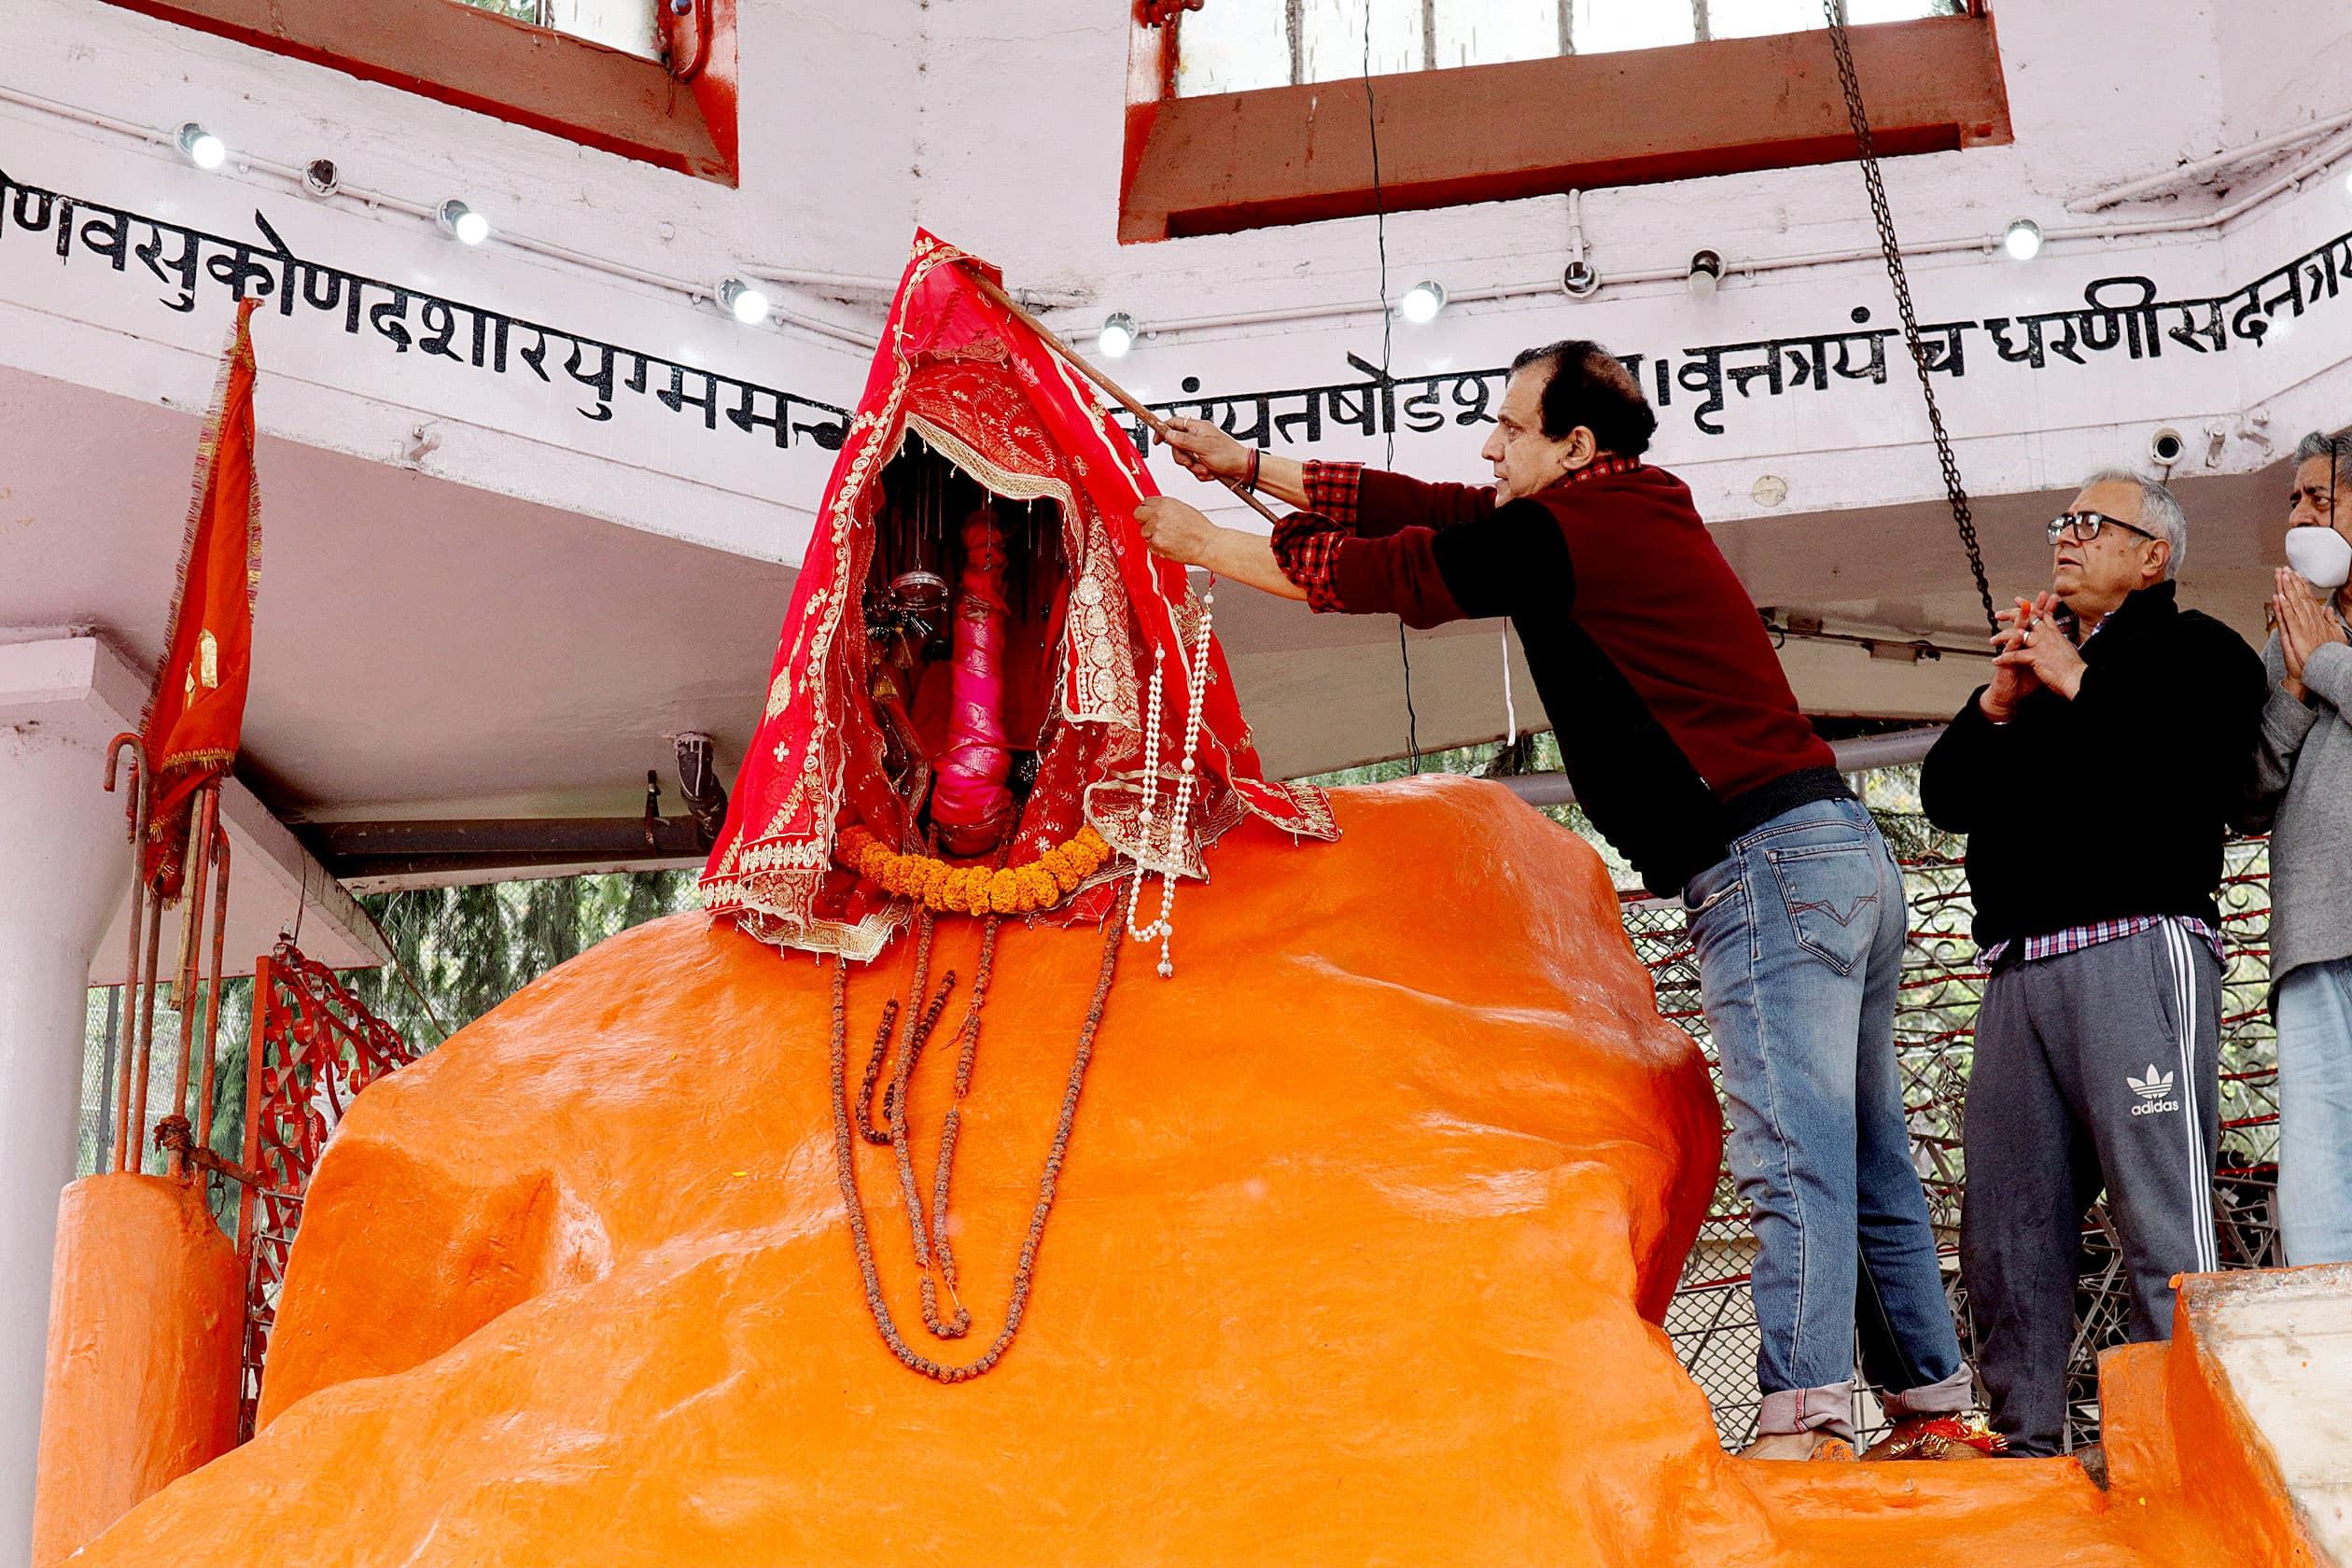 Devotees offer prayers at Sharika Temple in Kashmir